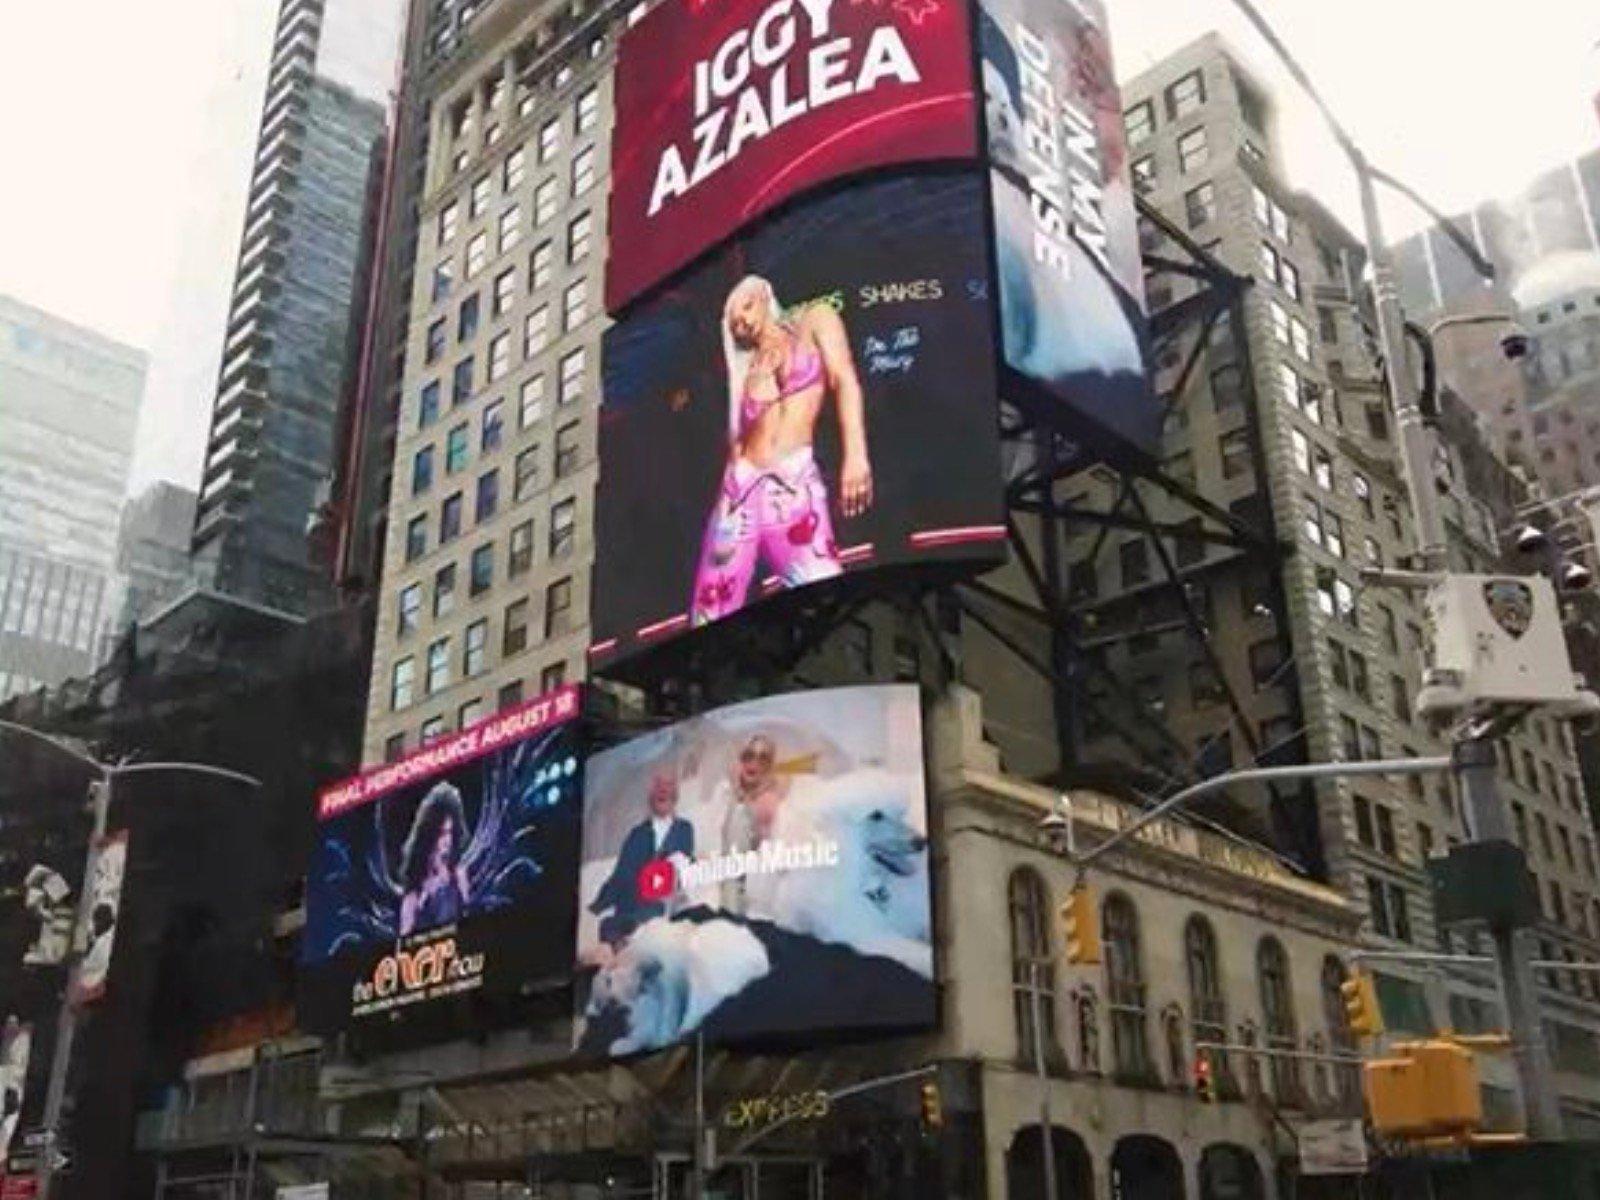 Iggy Azalea Video